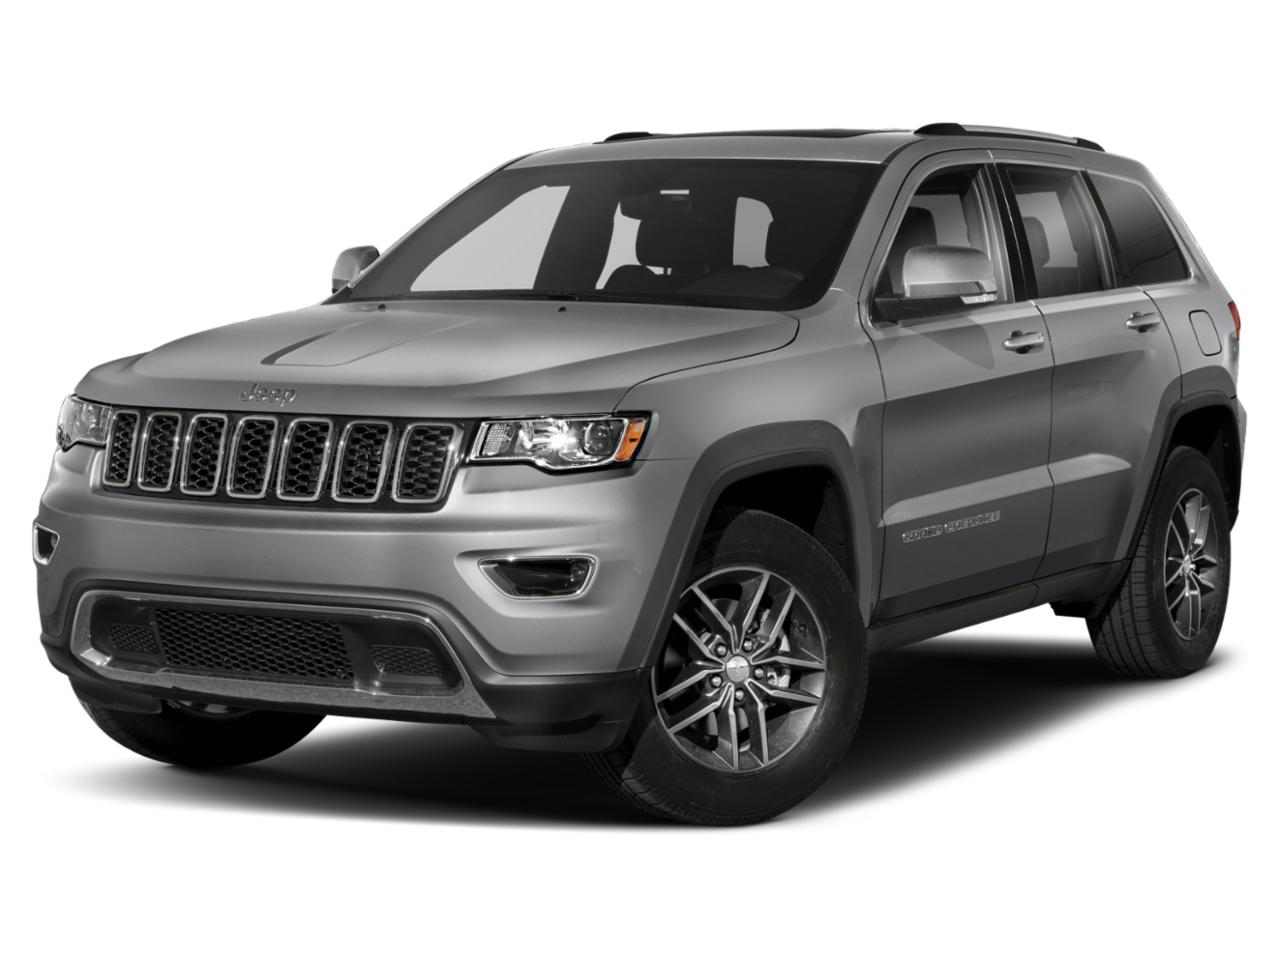 2020 Jeep Grand Cherokee Vehicle Photo in Jasper, GA 30143